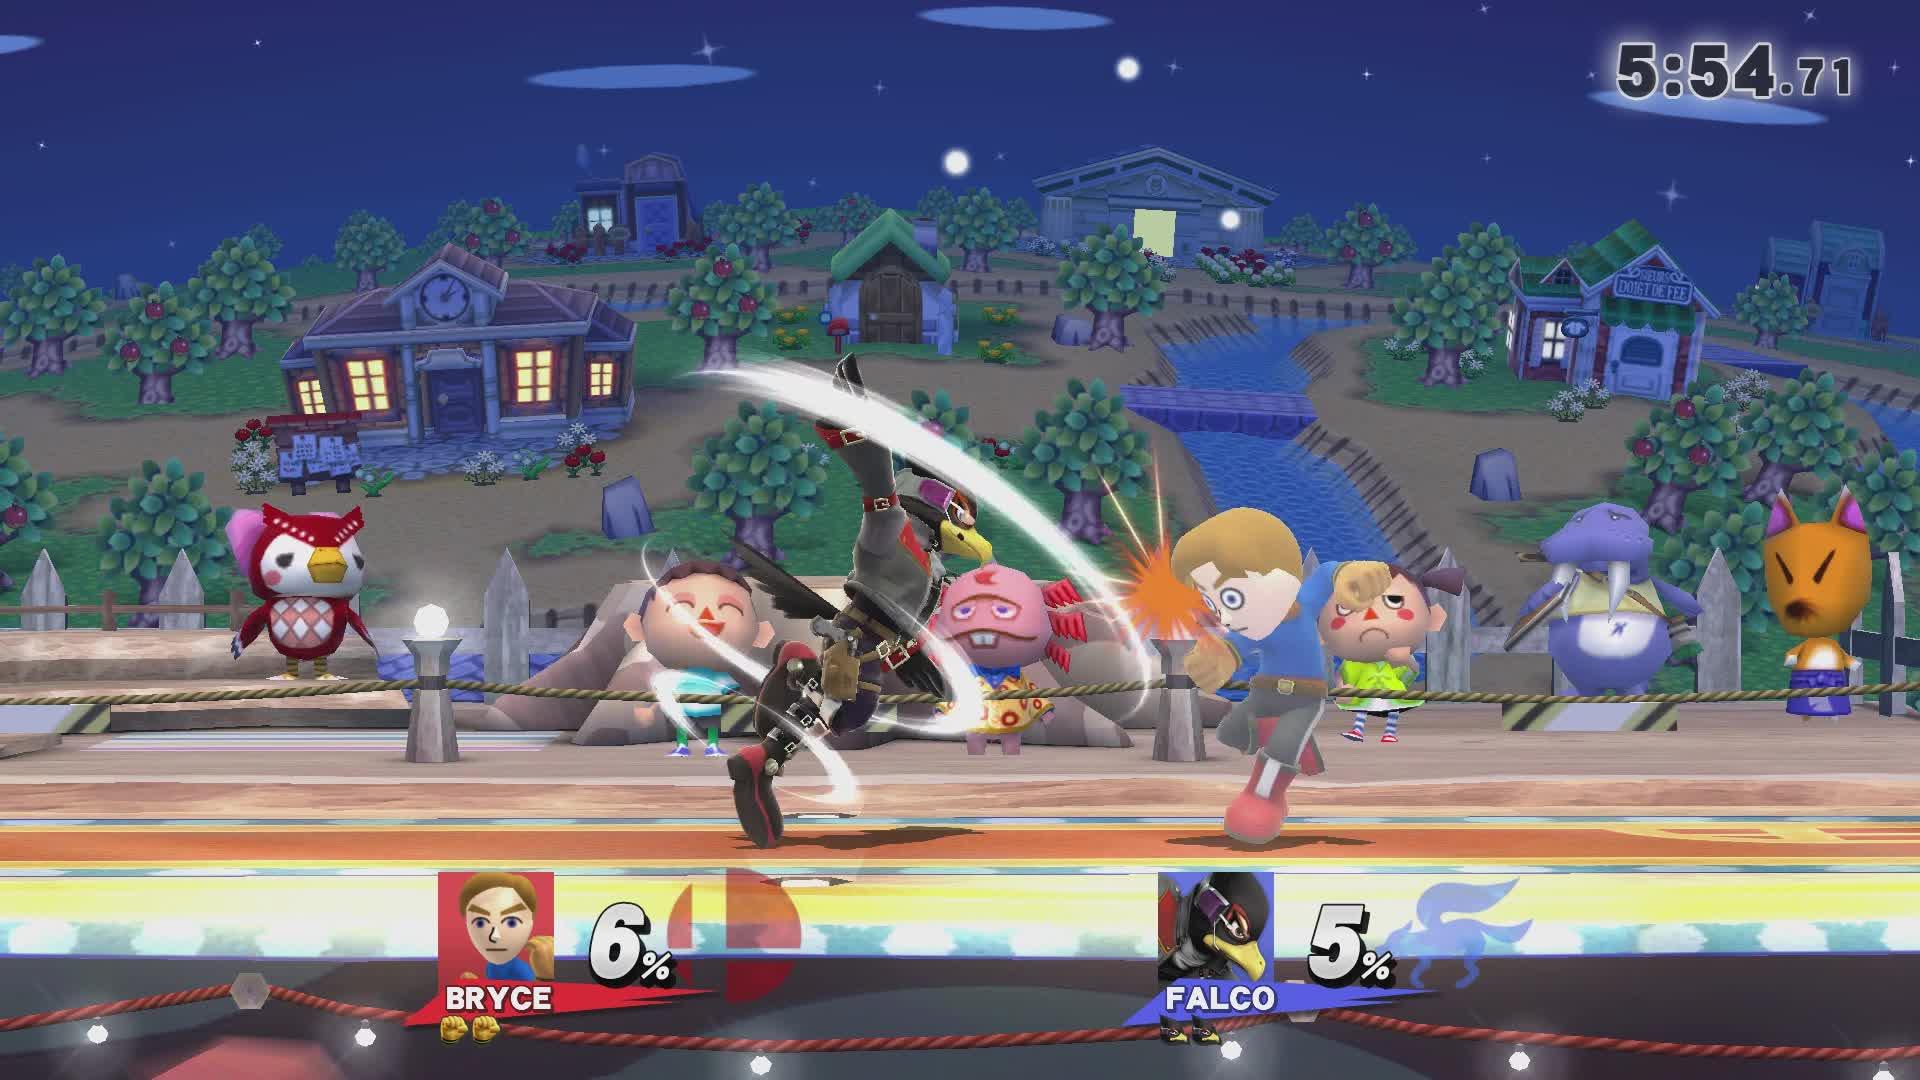 smashgifs, Super Smash Bros for Wii U - My Great Capture - 2018-05-08 19-44-38 GIFs